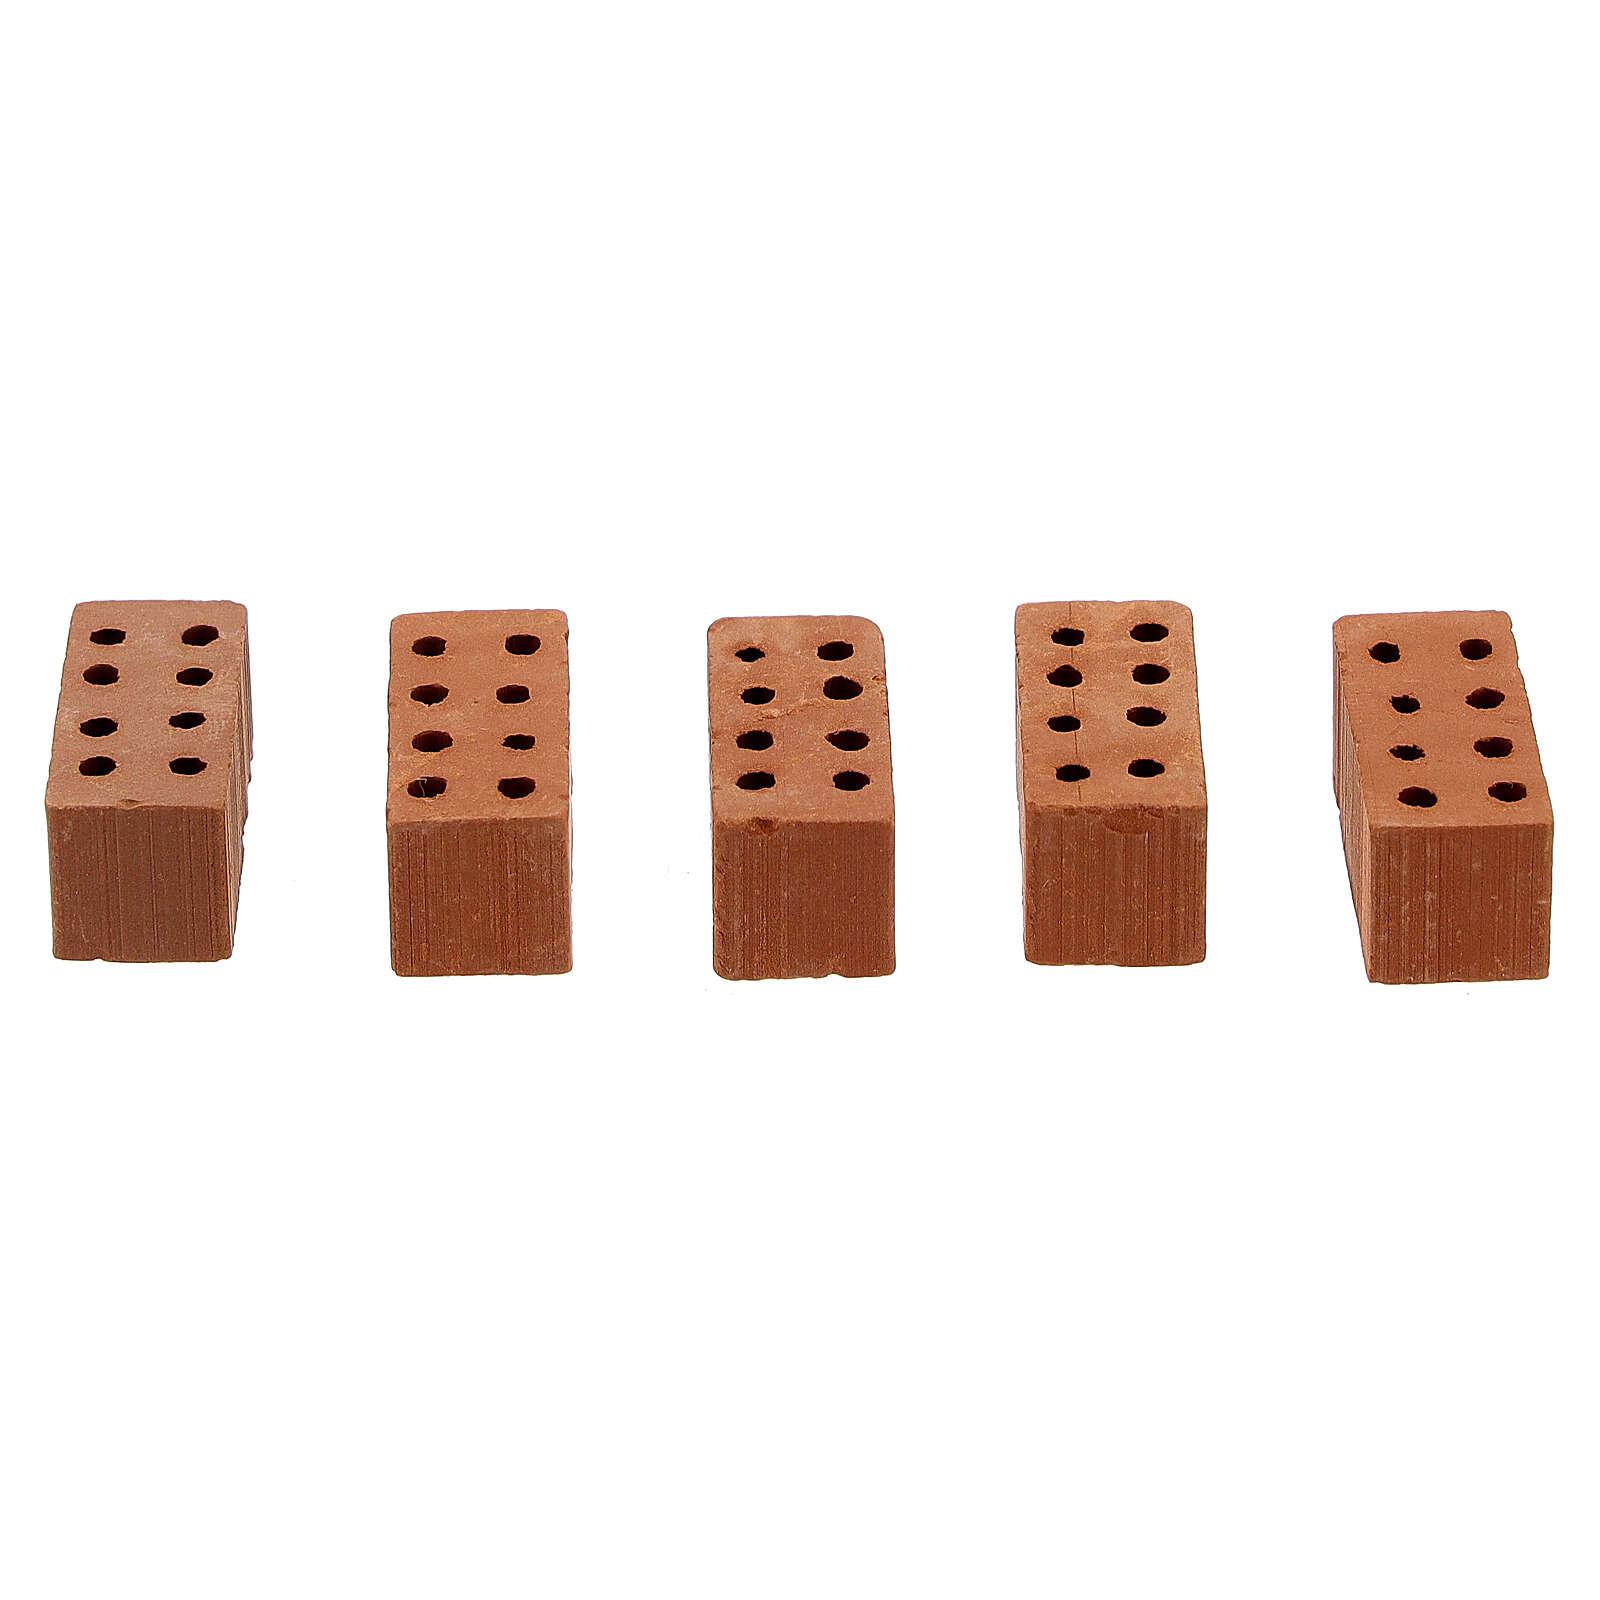 Rectangular terracotta bricks 1x2x1 cm 100 pcs 4